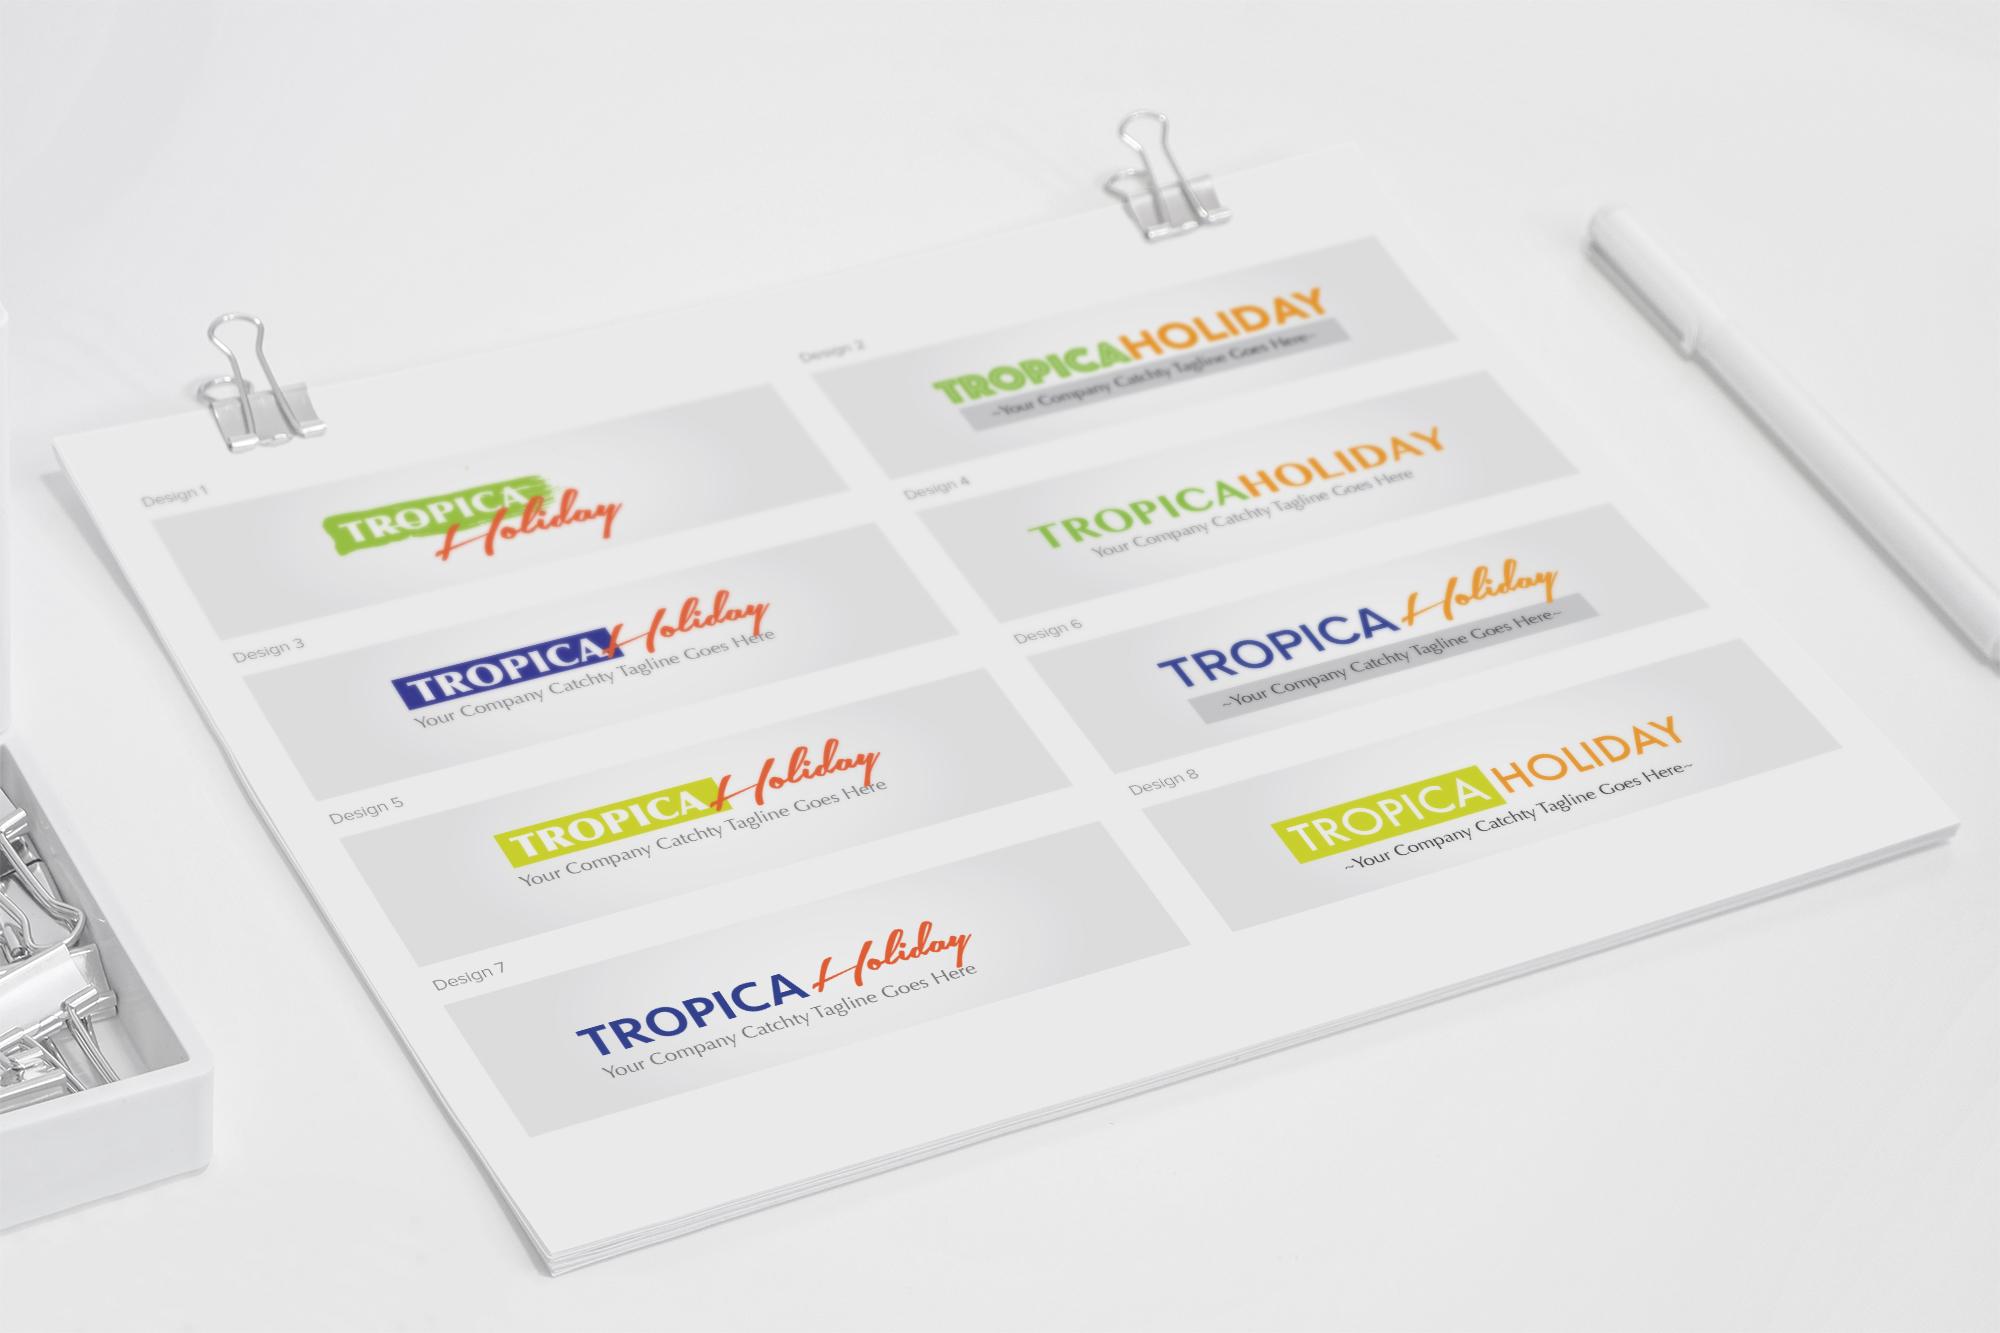 Tropica-holiday-sketch